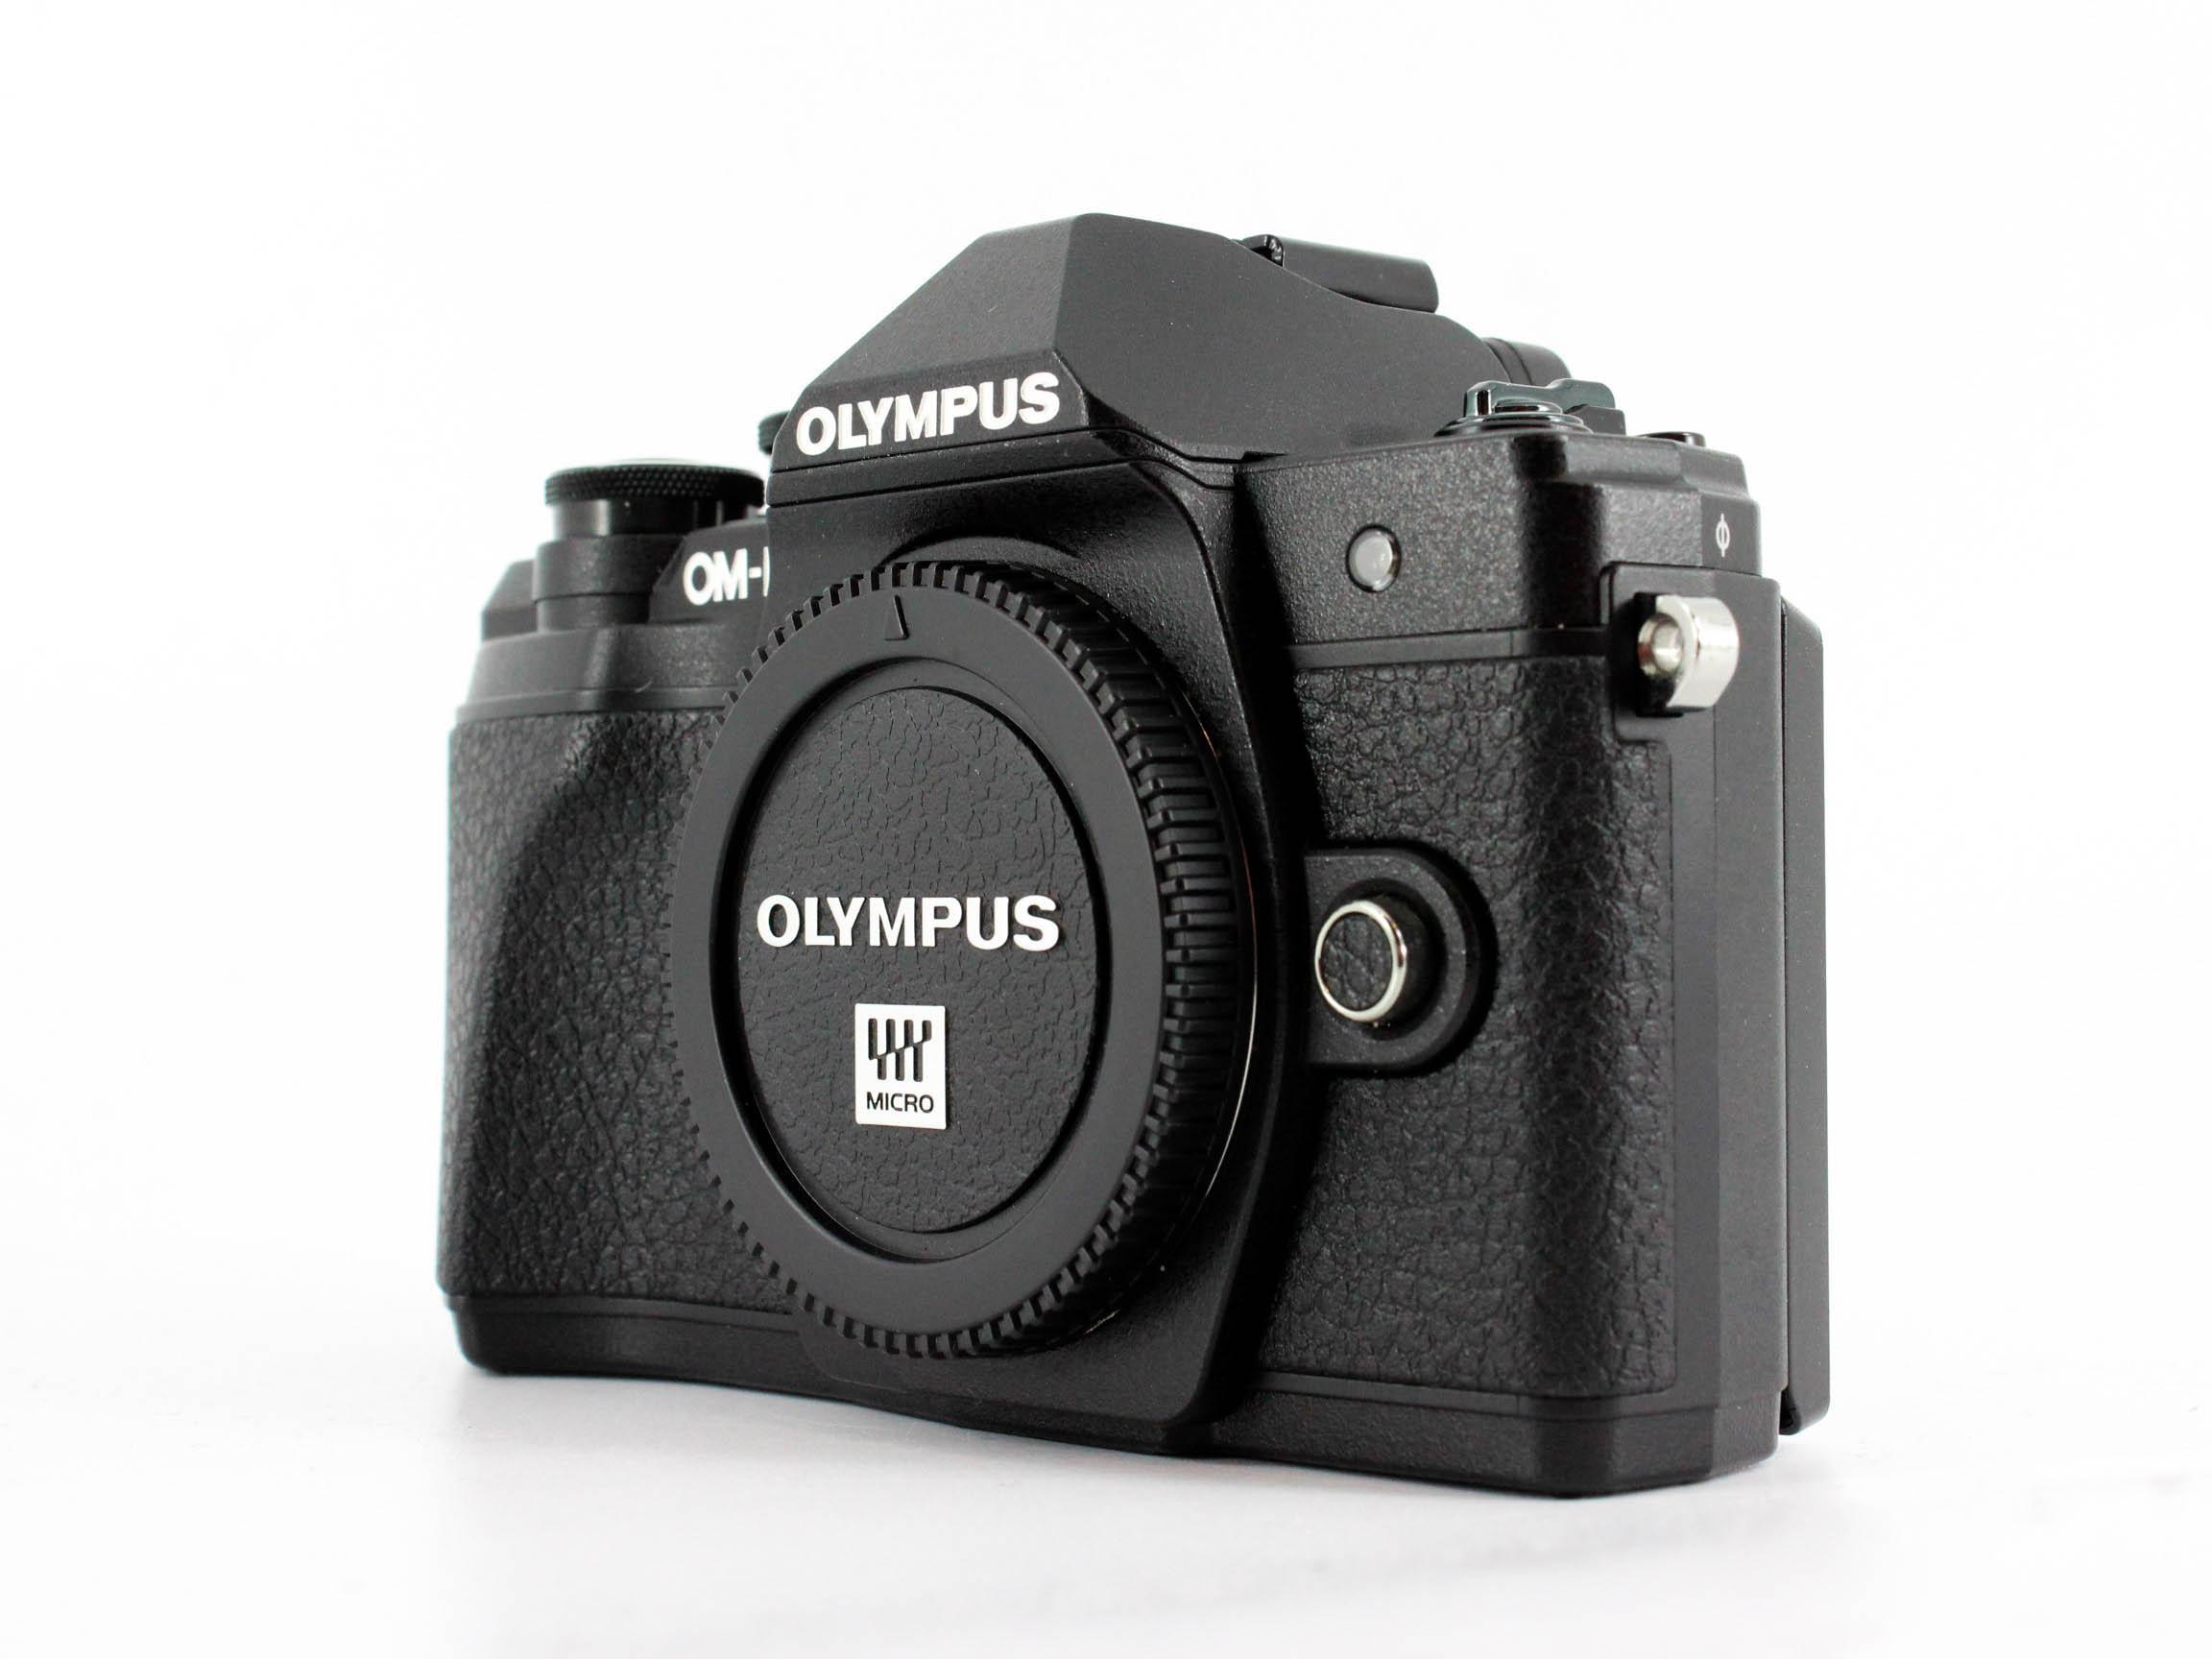 olympus omd em10 iii specs image